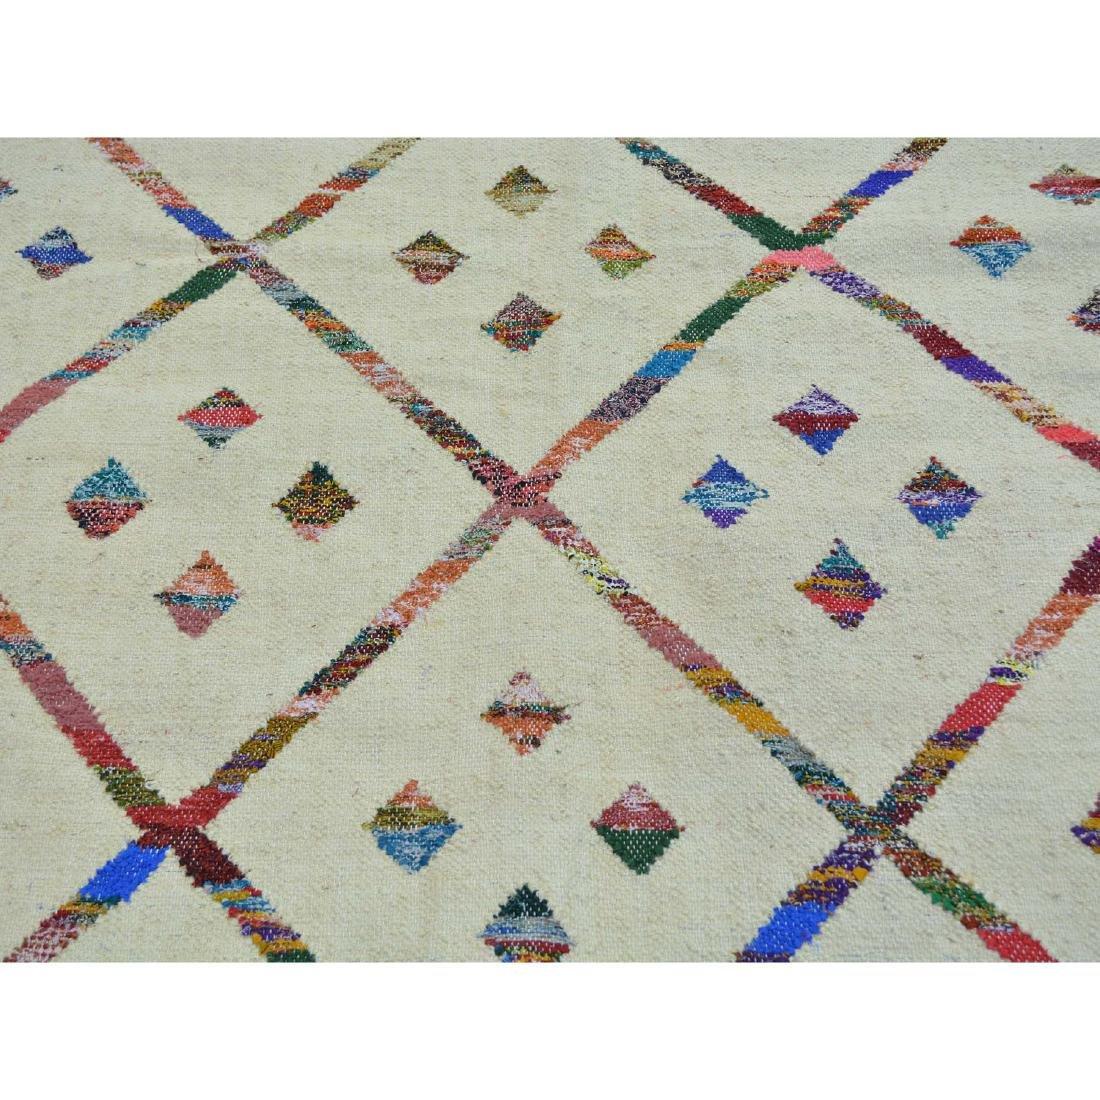 Hand Woven Flat Weave Wool Sari Silk Durie Rug 8.1x9.10 - 4